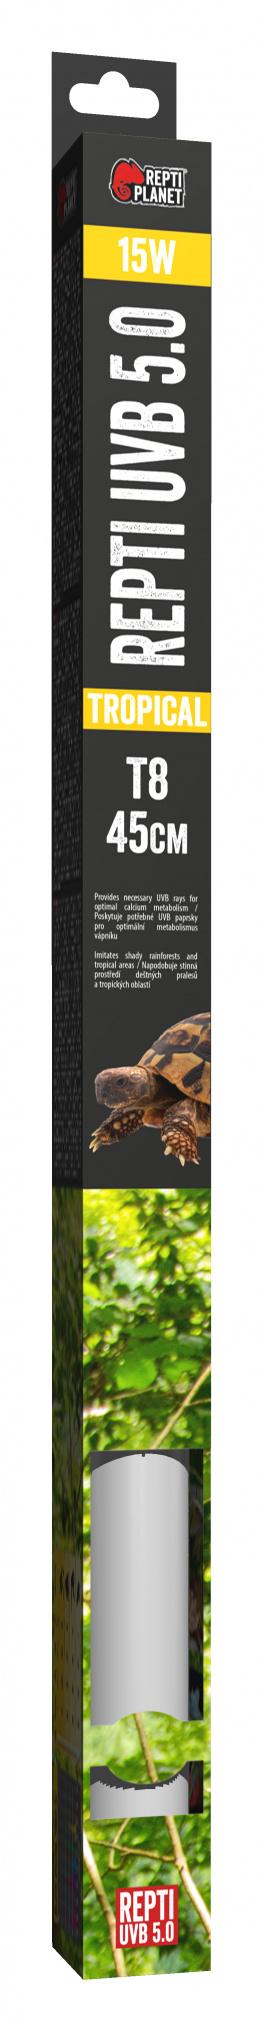 Лампа для террариумов - ReptiPlanet Repti T8 UVB 5.0 15W, 45 см